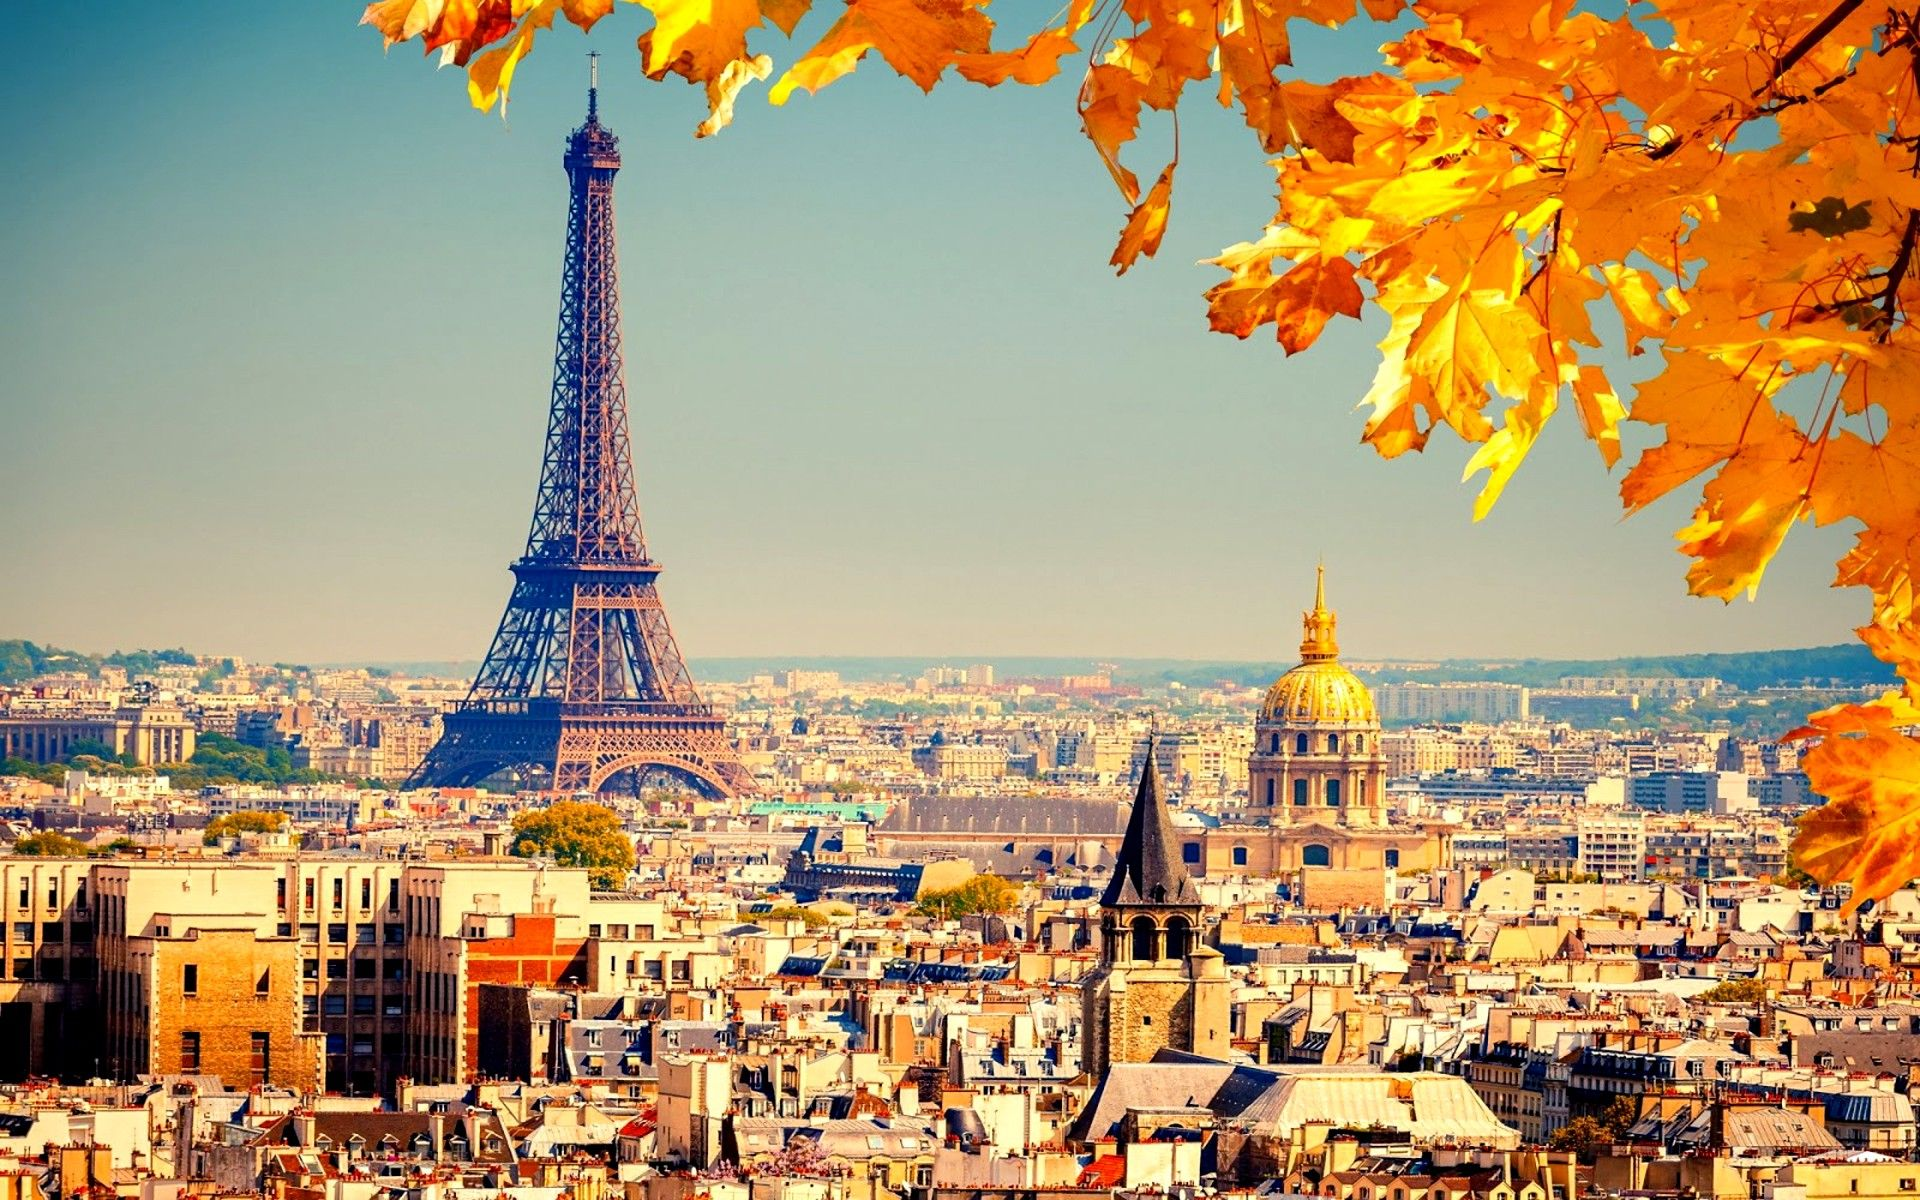 Wallpaper download paris - Download Paris Desktop Backgrounds Tumblr Wallpaper Hd L7w 1920x1200 Px 672 79 Kb